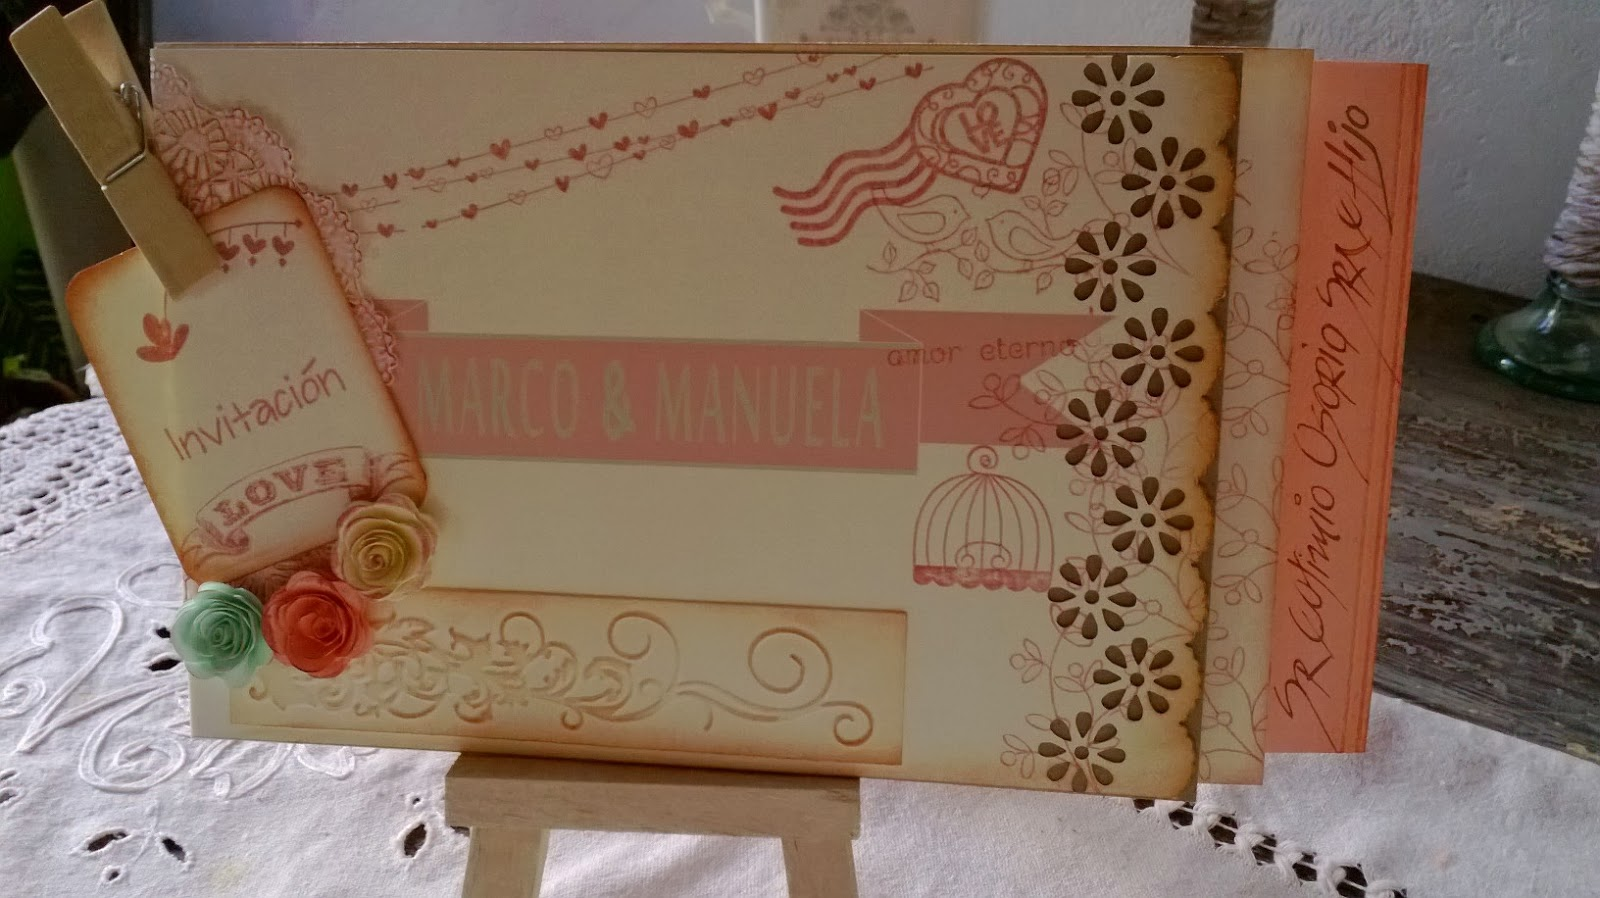 Bodas dise os marta correa tarjetas de invitaci n a bodas - Disenos tarjetas de boda ...